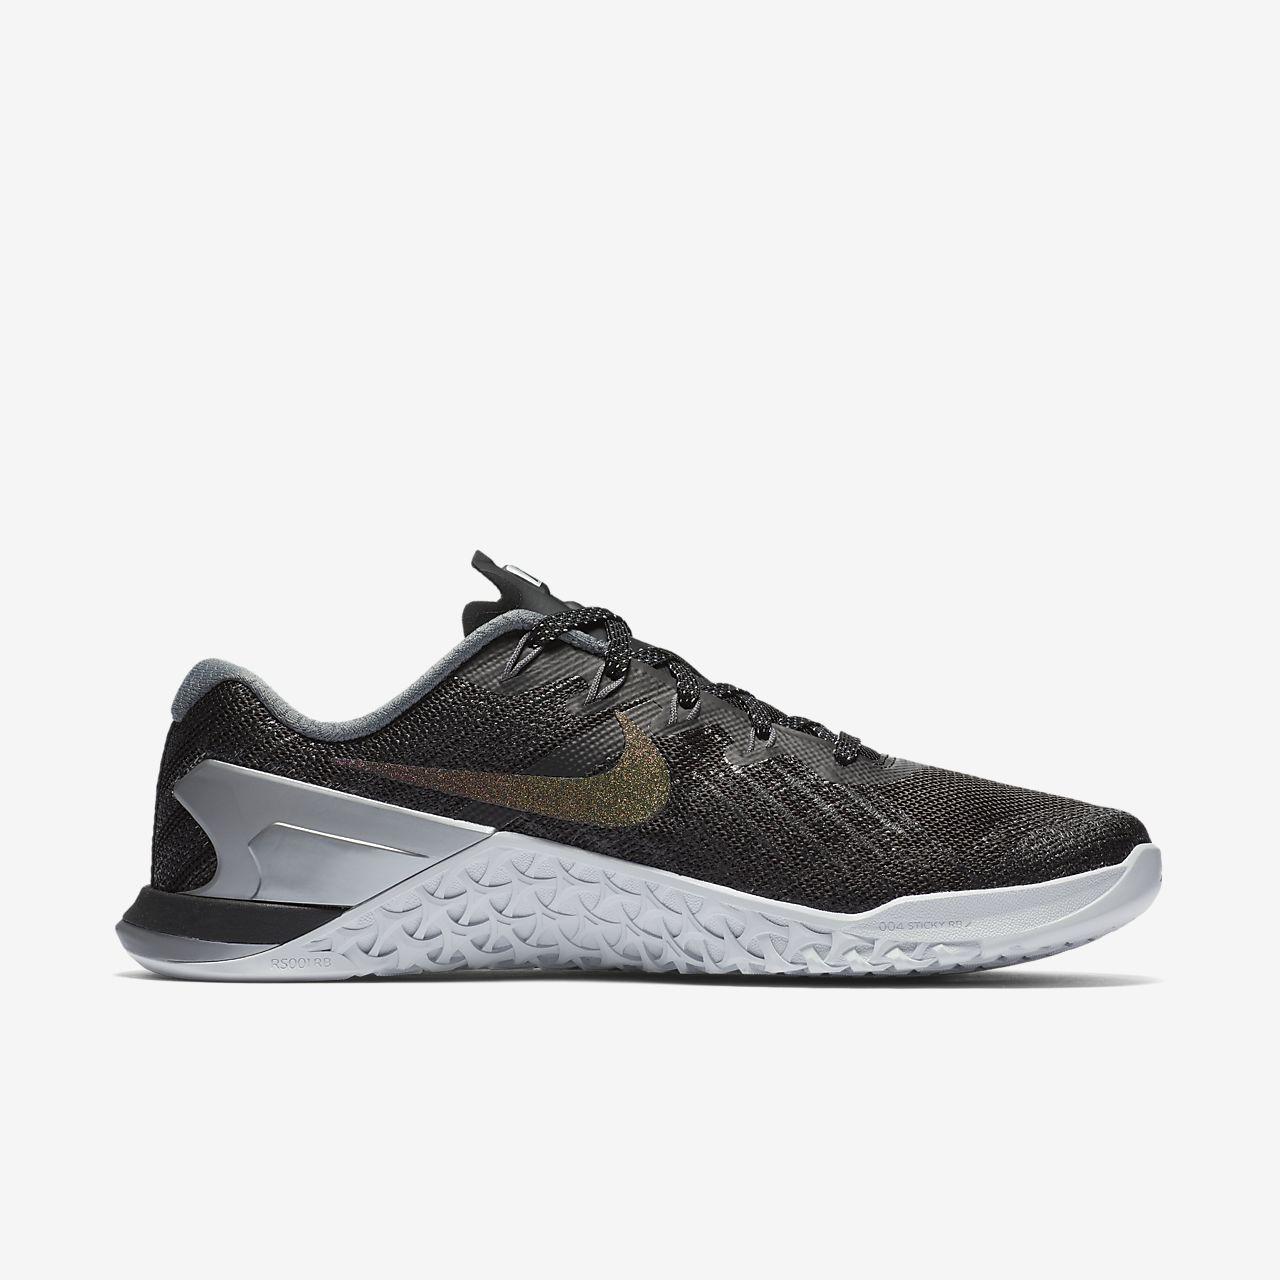 ... Nike Metcon 3 Metallic Women's Training Shoe